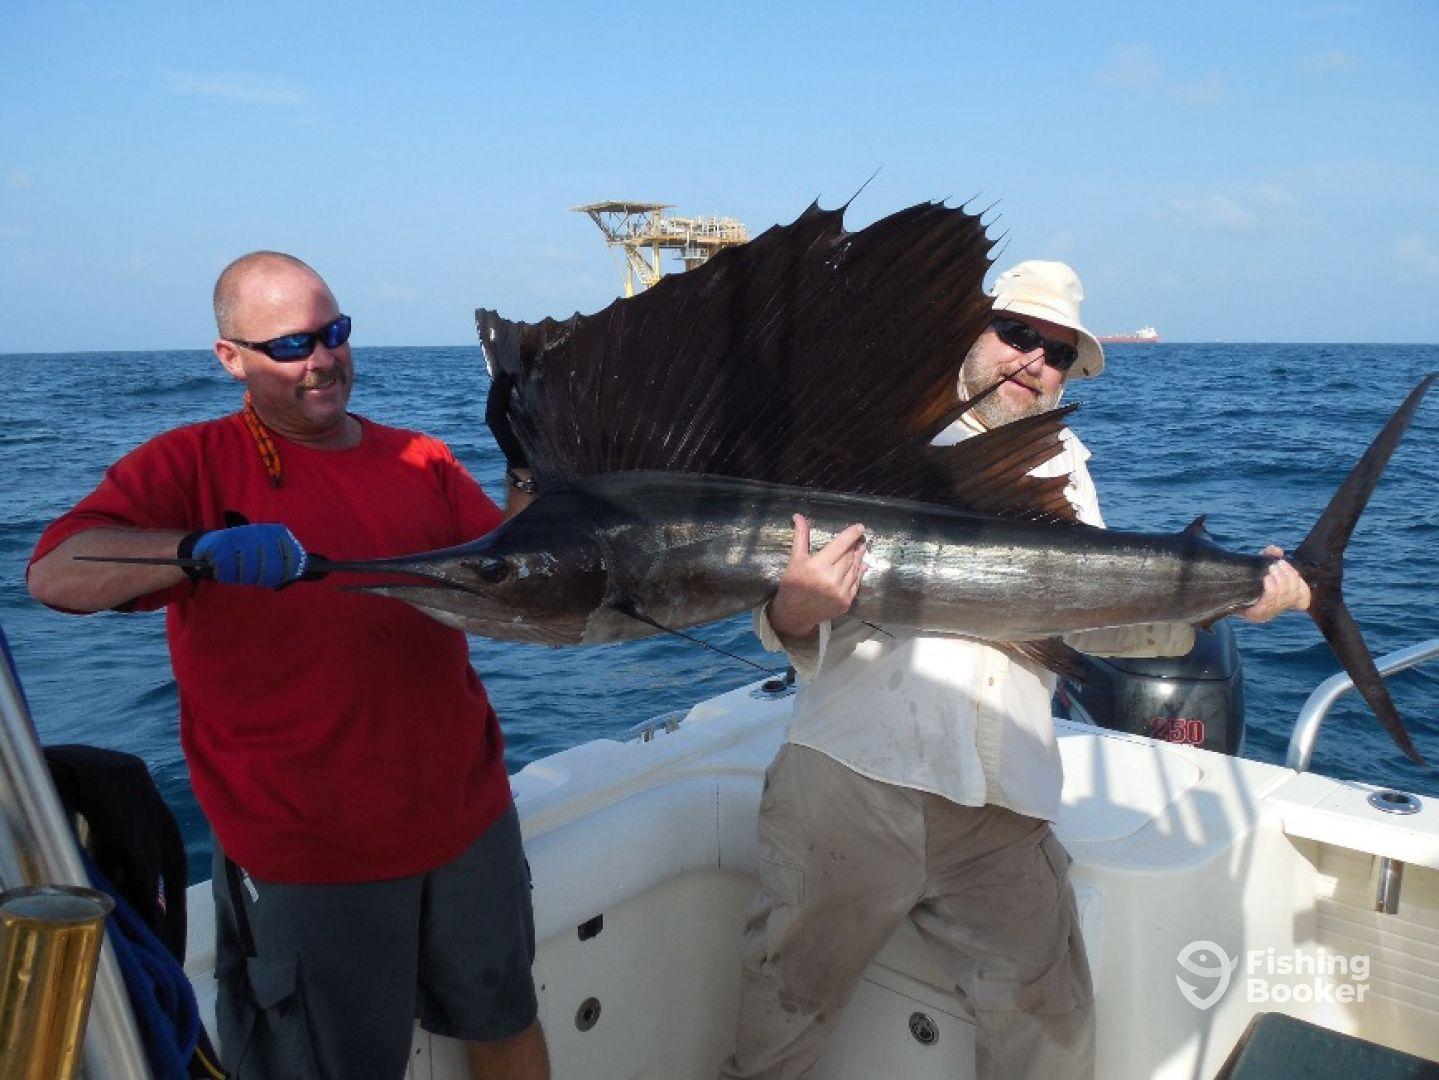 Hingle S Guide Service Bolivar Peninsula Tx Fishingbooker